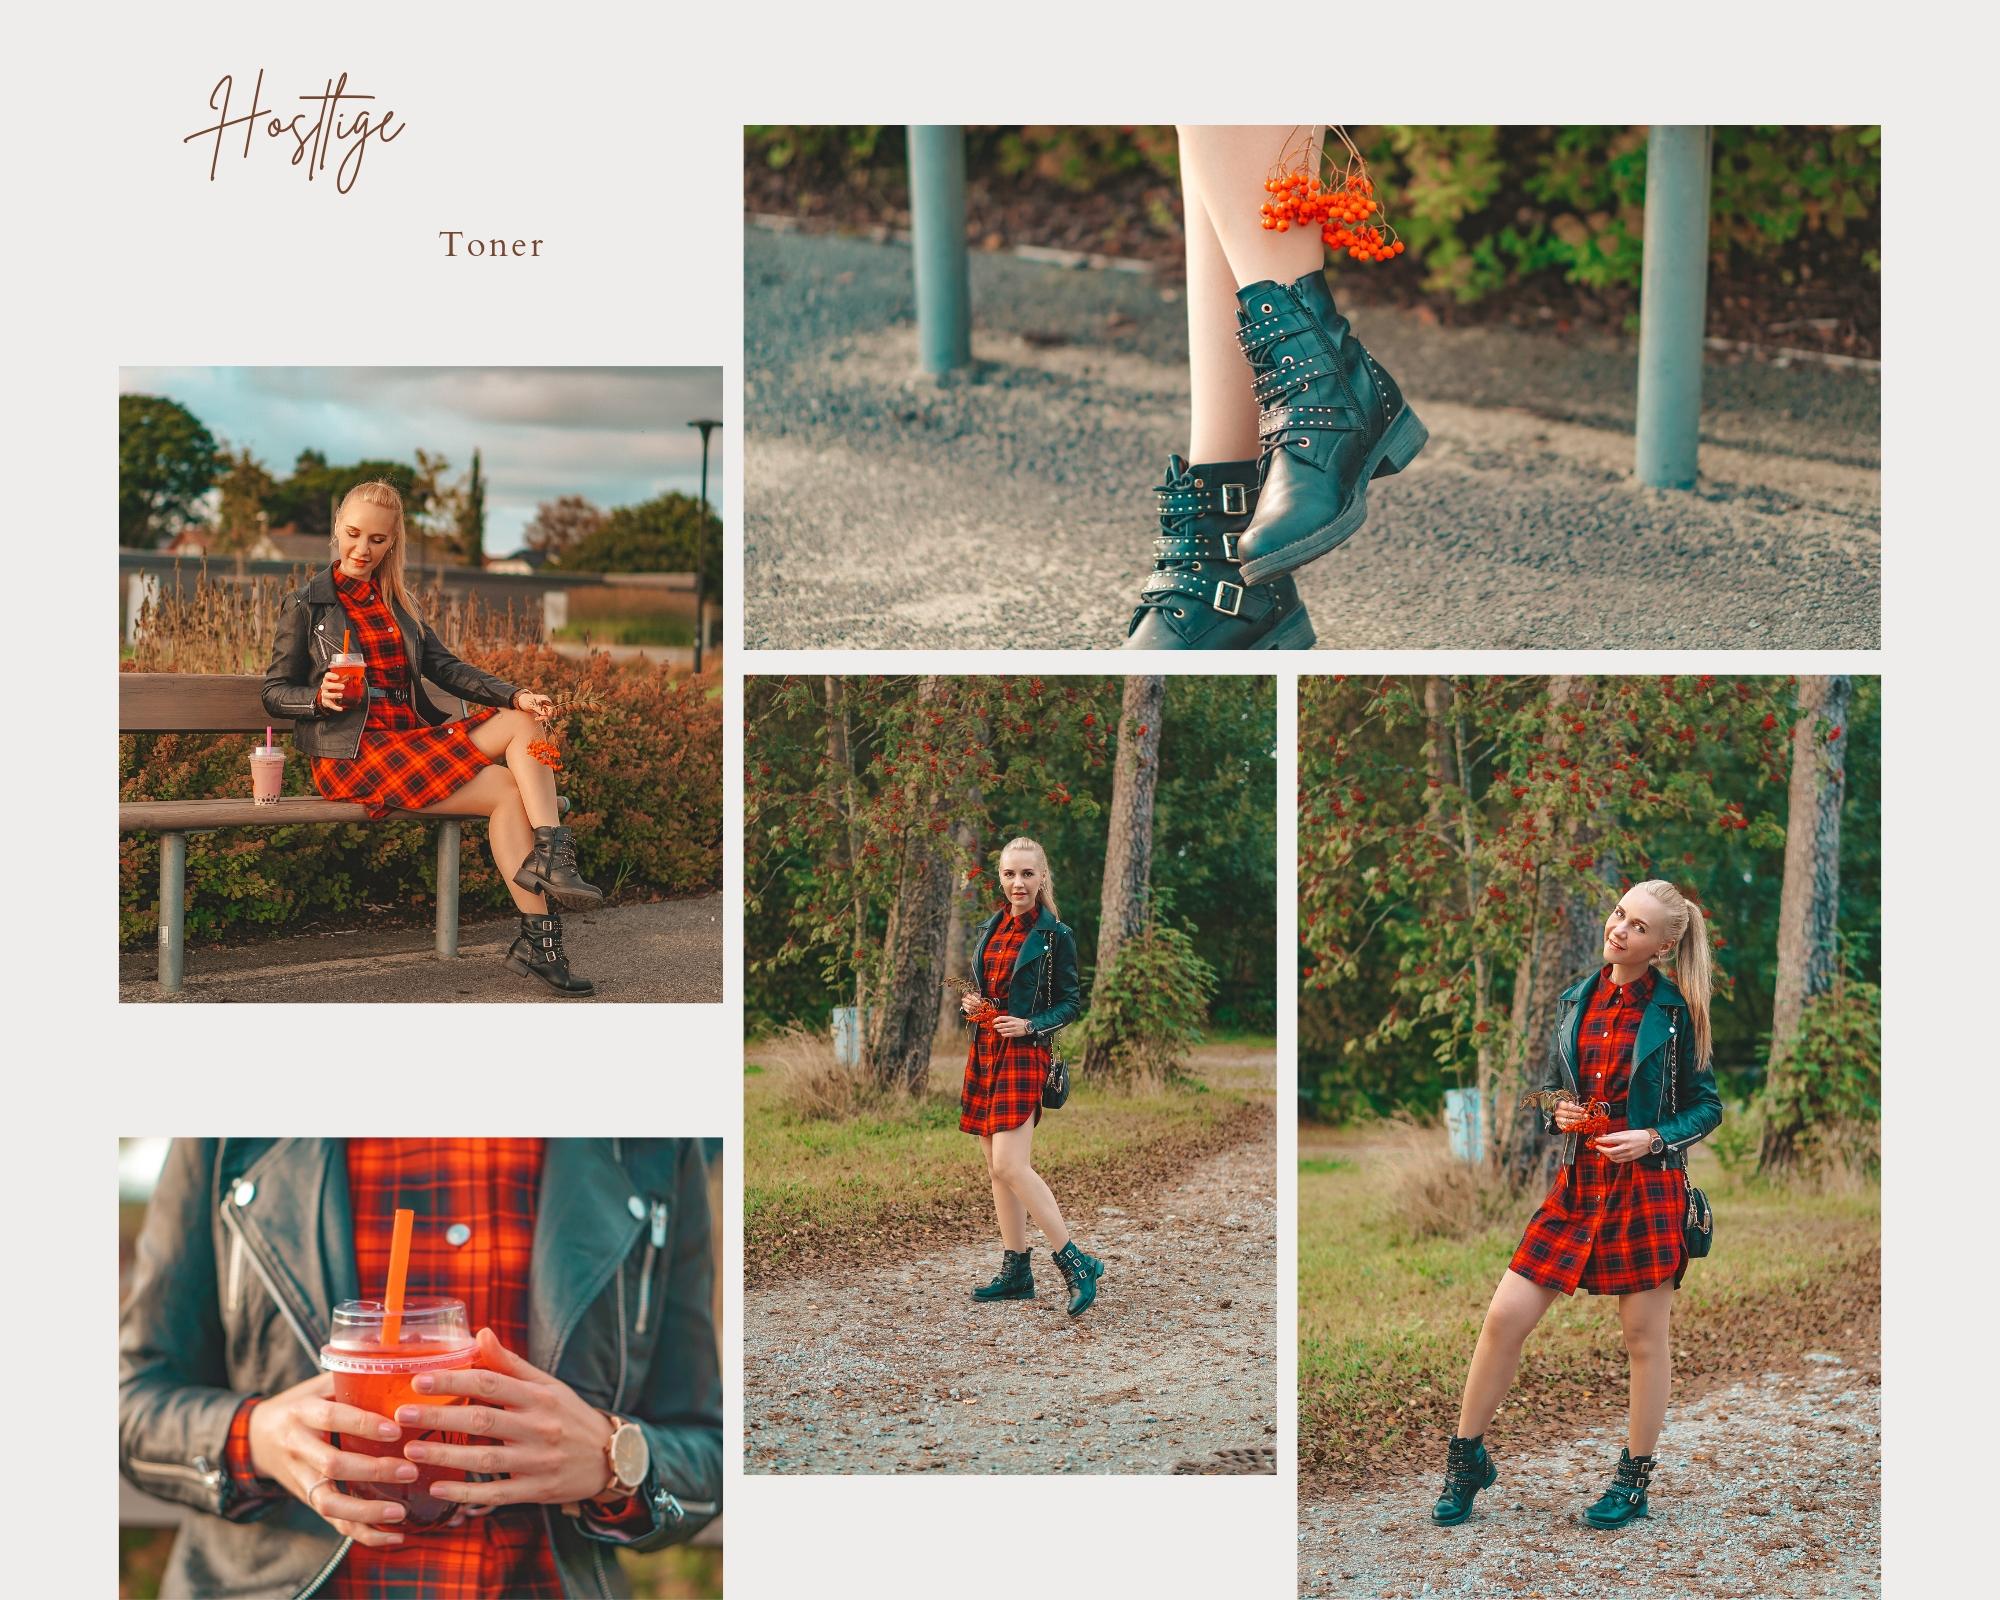 rød kjole høsten